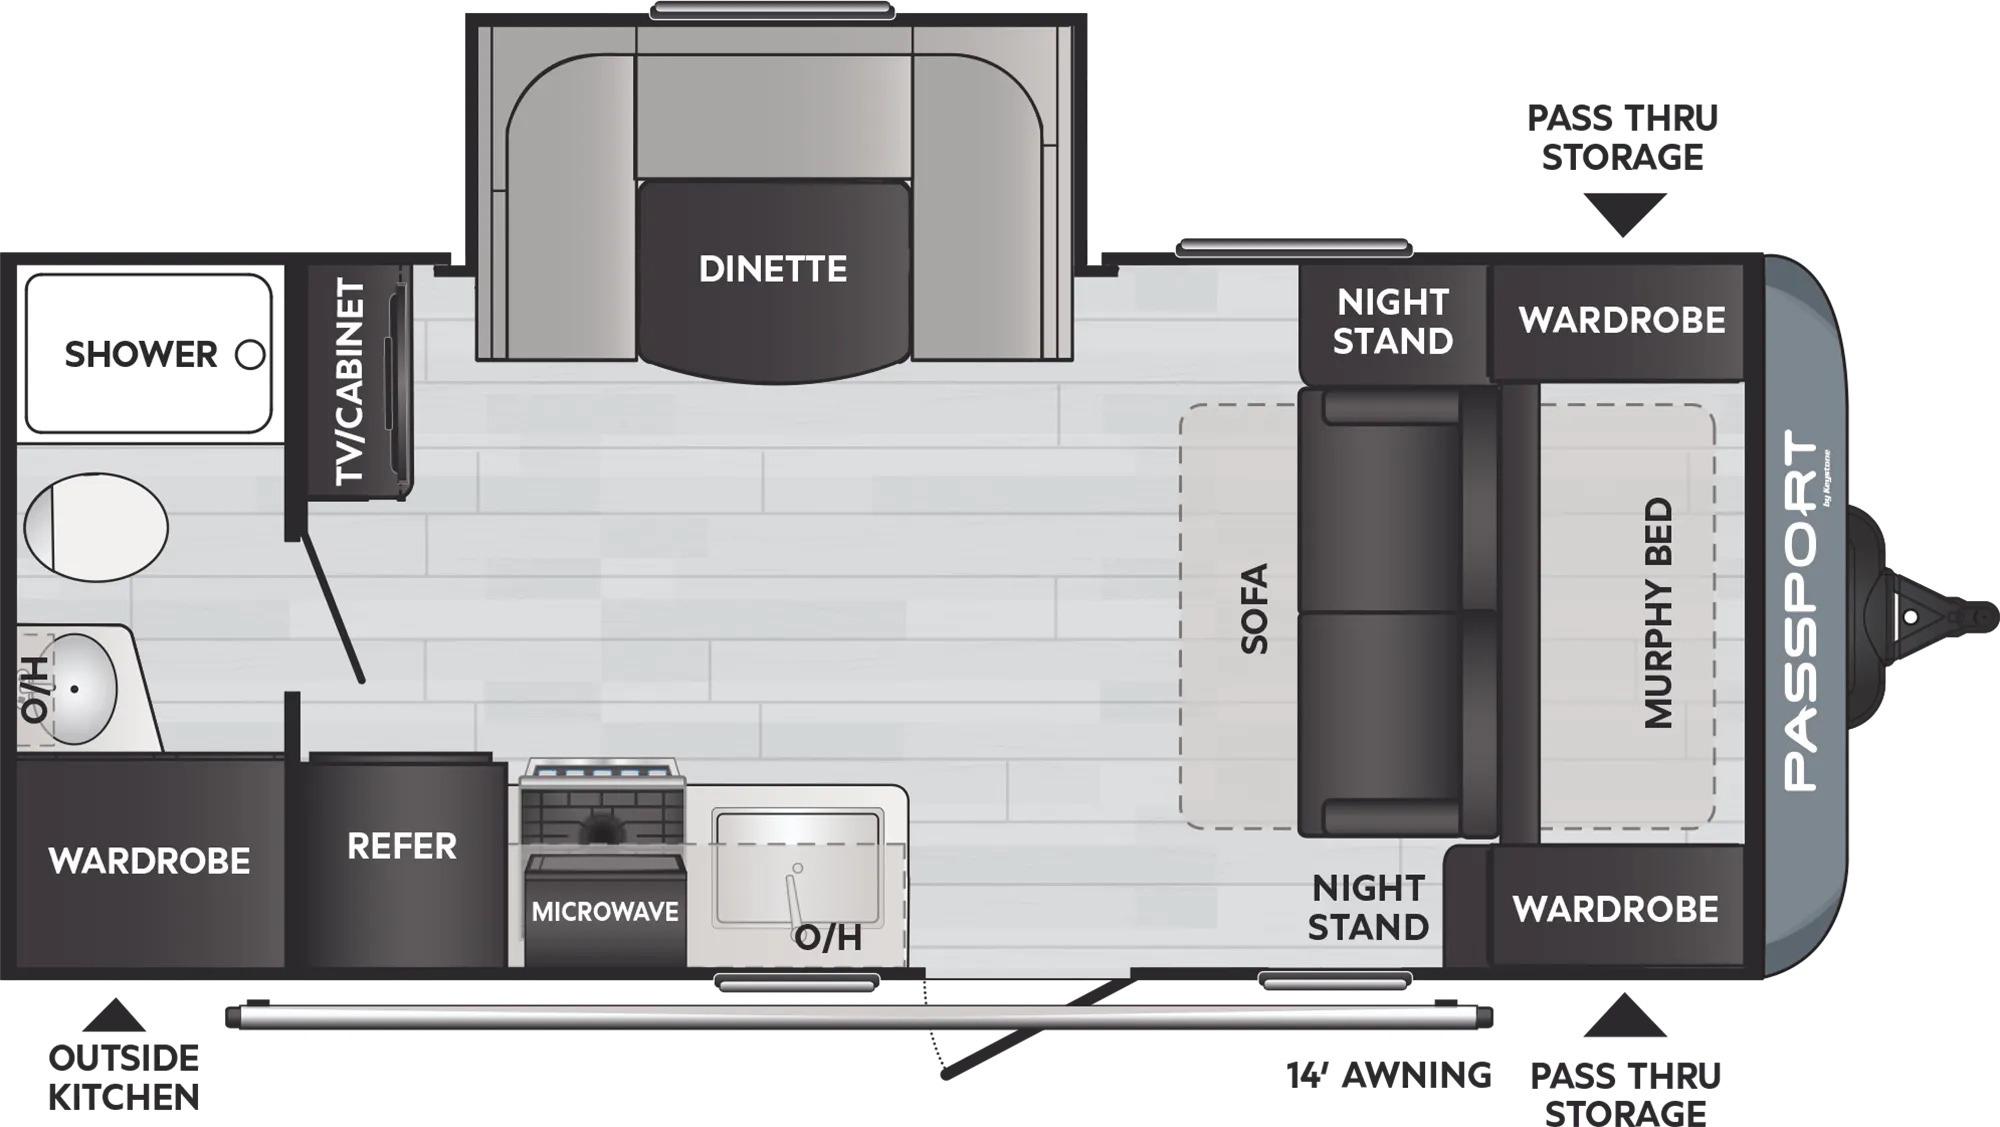 View Floor Plan for 2022 KEYSTONE PASSPORT 189RB